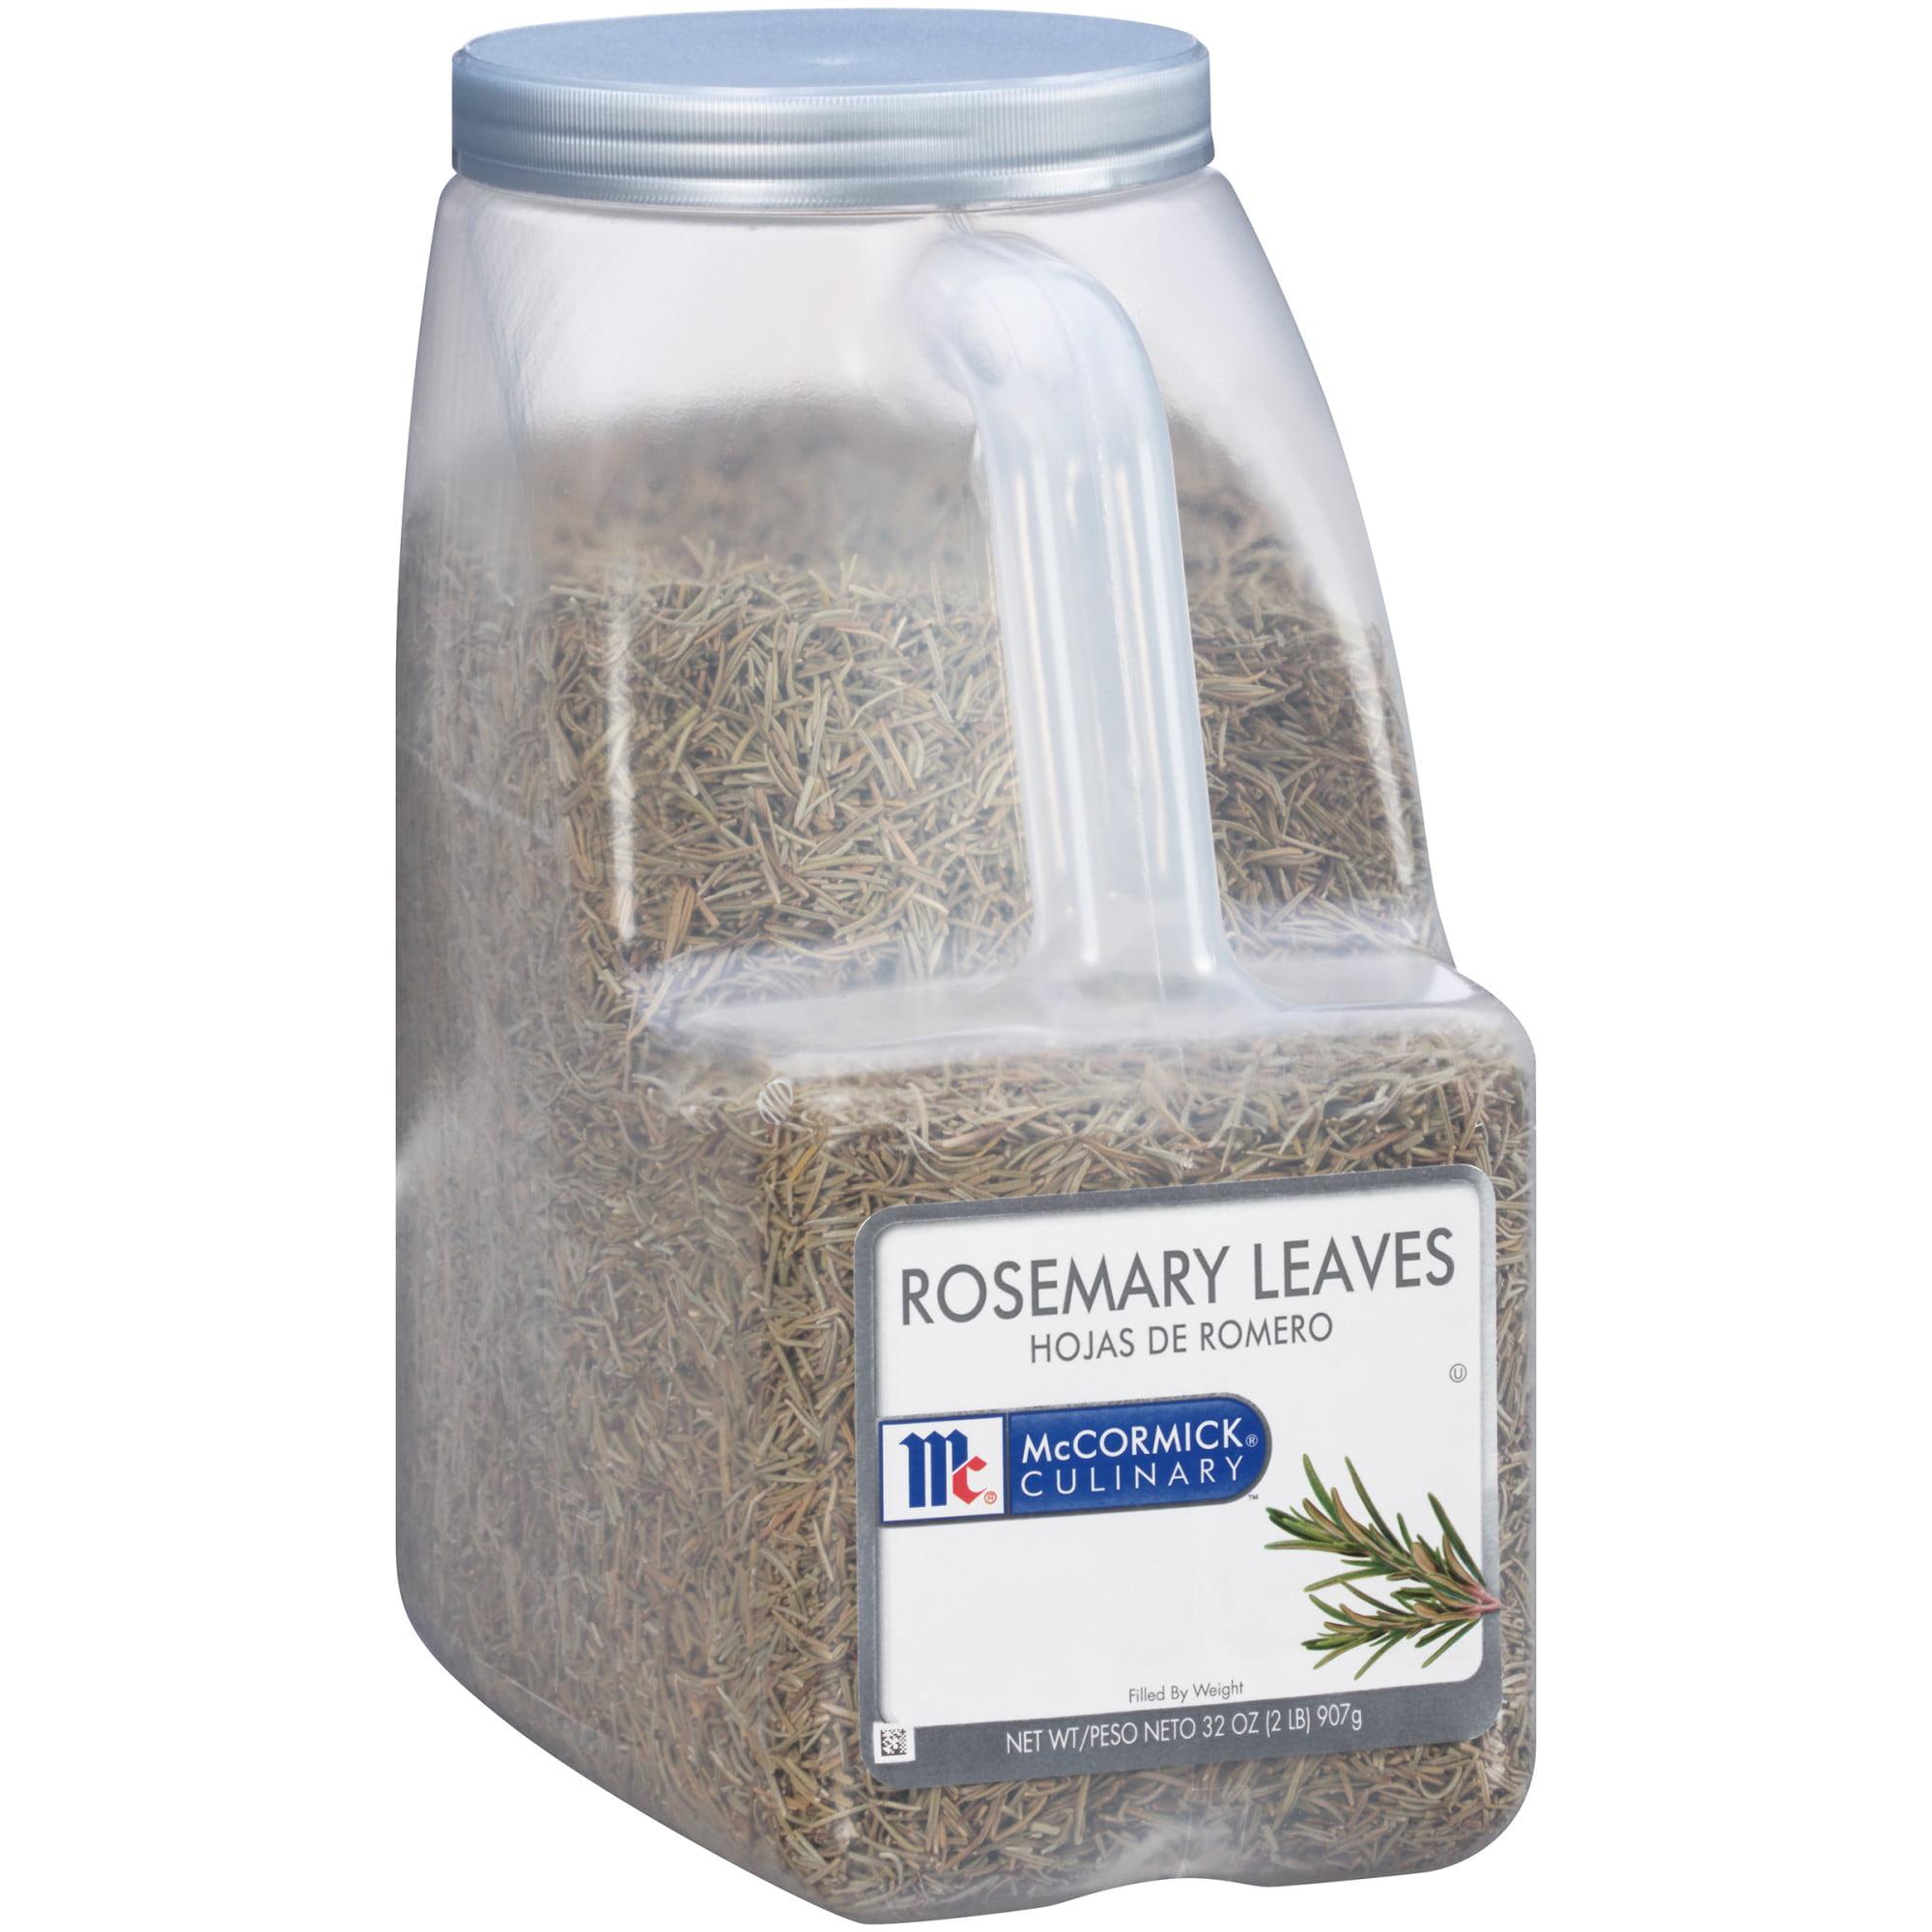 McCormick Culinary Rosemary Leaves, 2 lbs